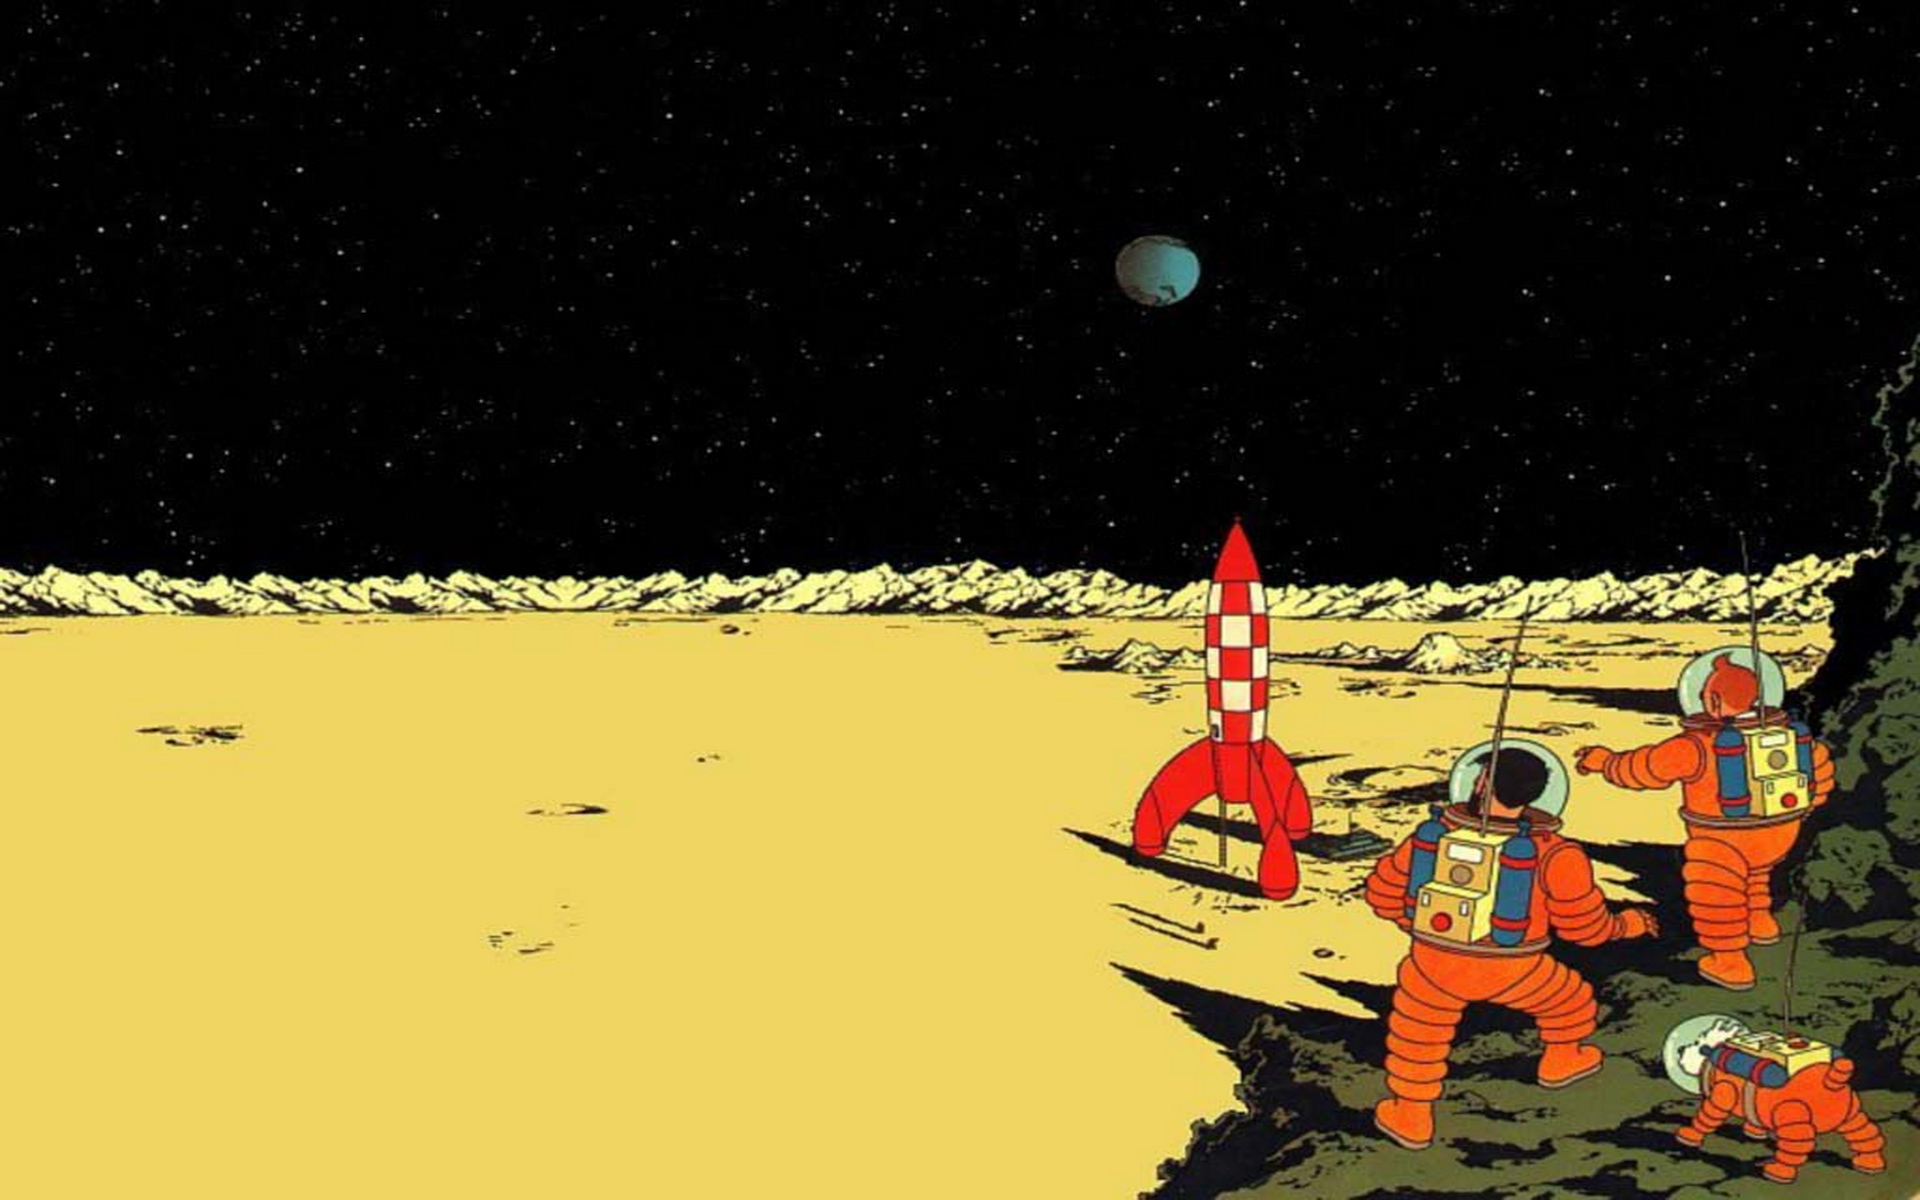 Tintin Wallpaper 33 HD Desktop Wallpapers 1920x1200